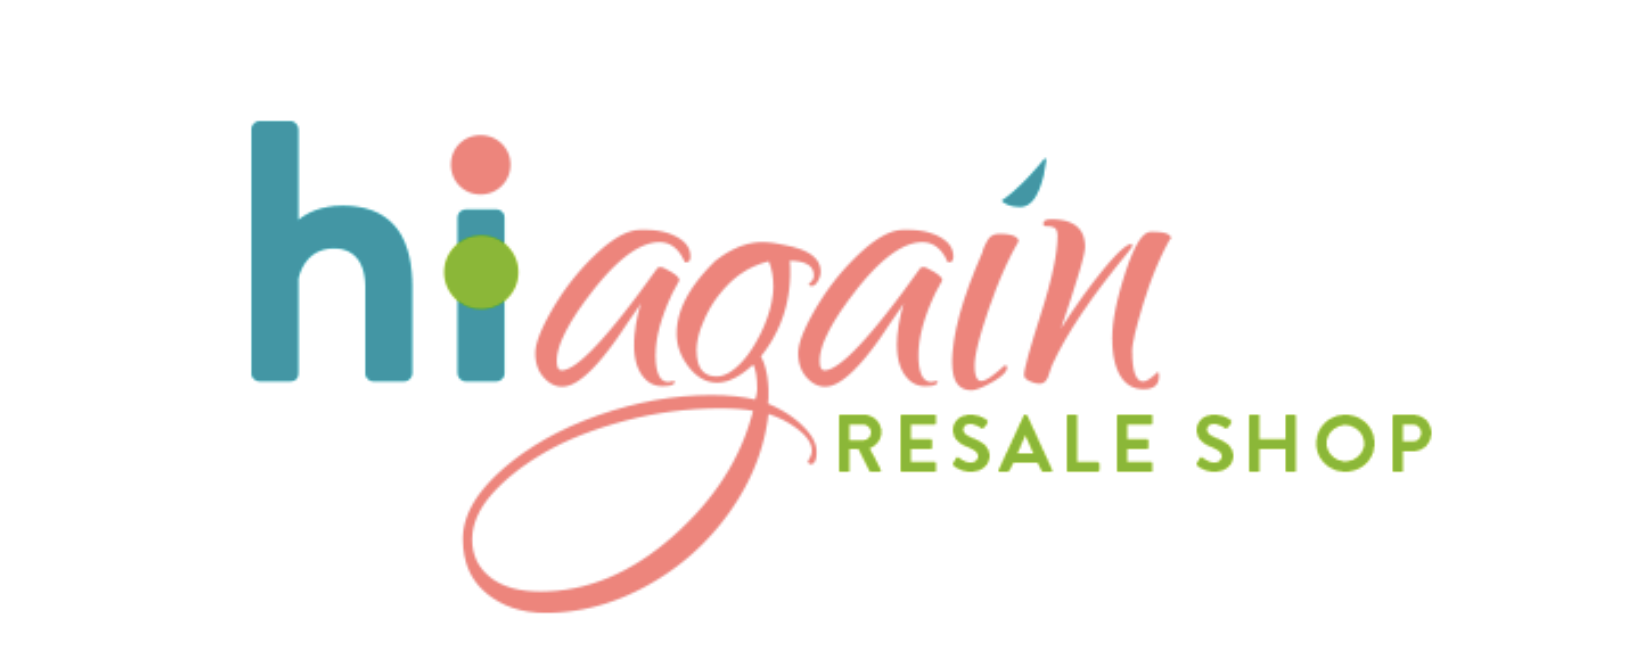 Hi Again Resale Shop